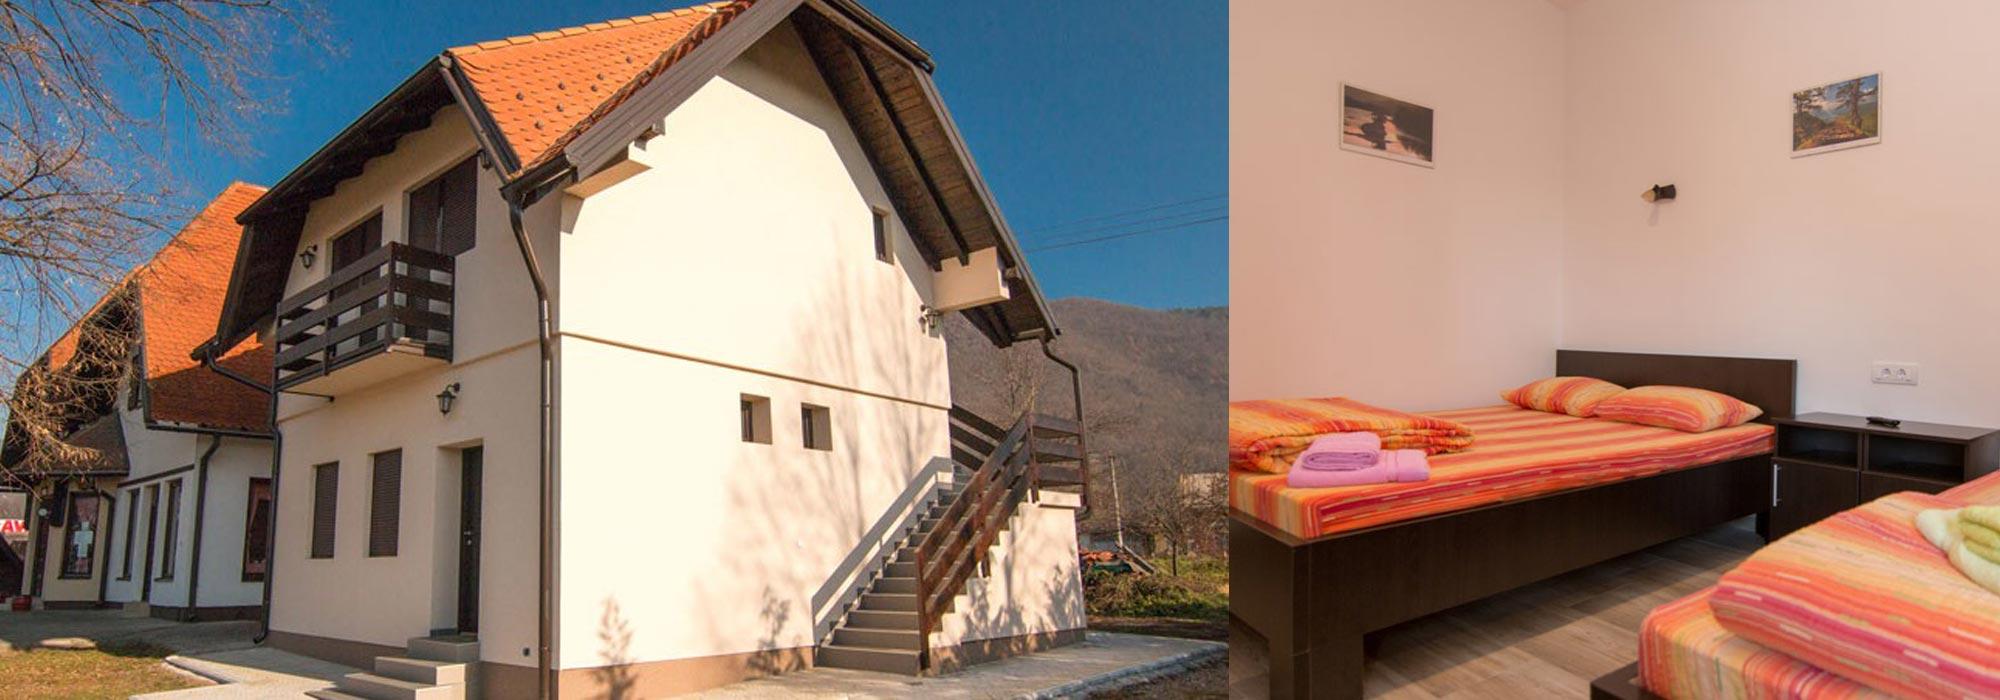 Prenoćište Drinski Konak- sobe pored Drine